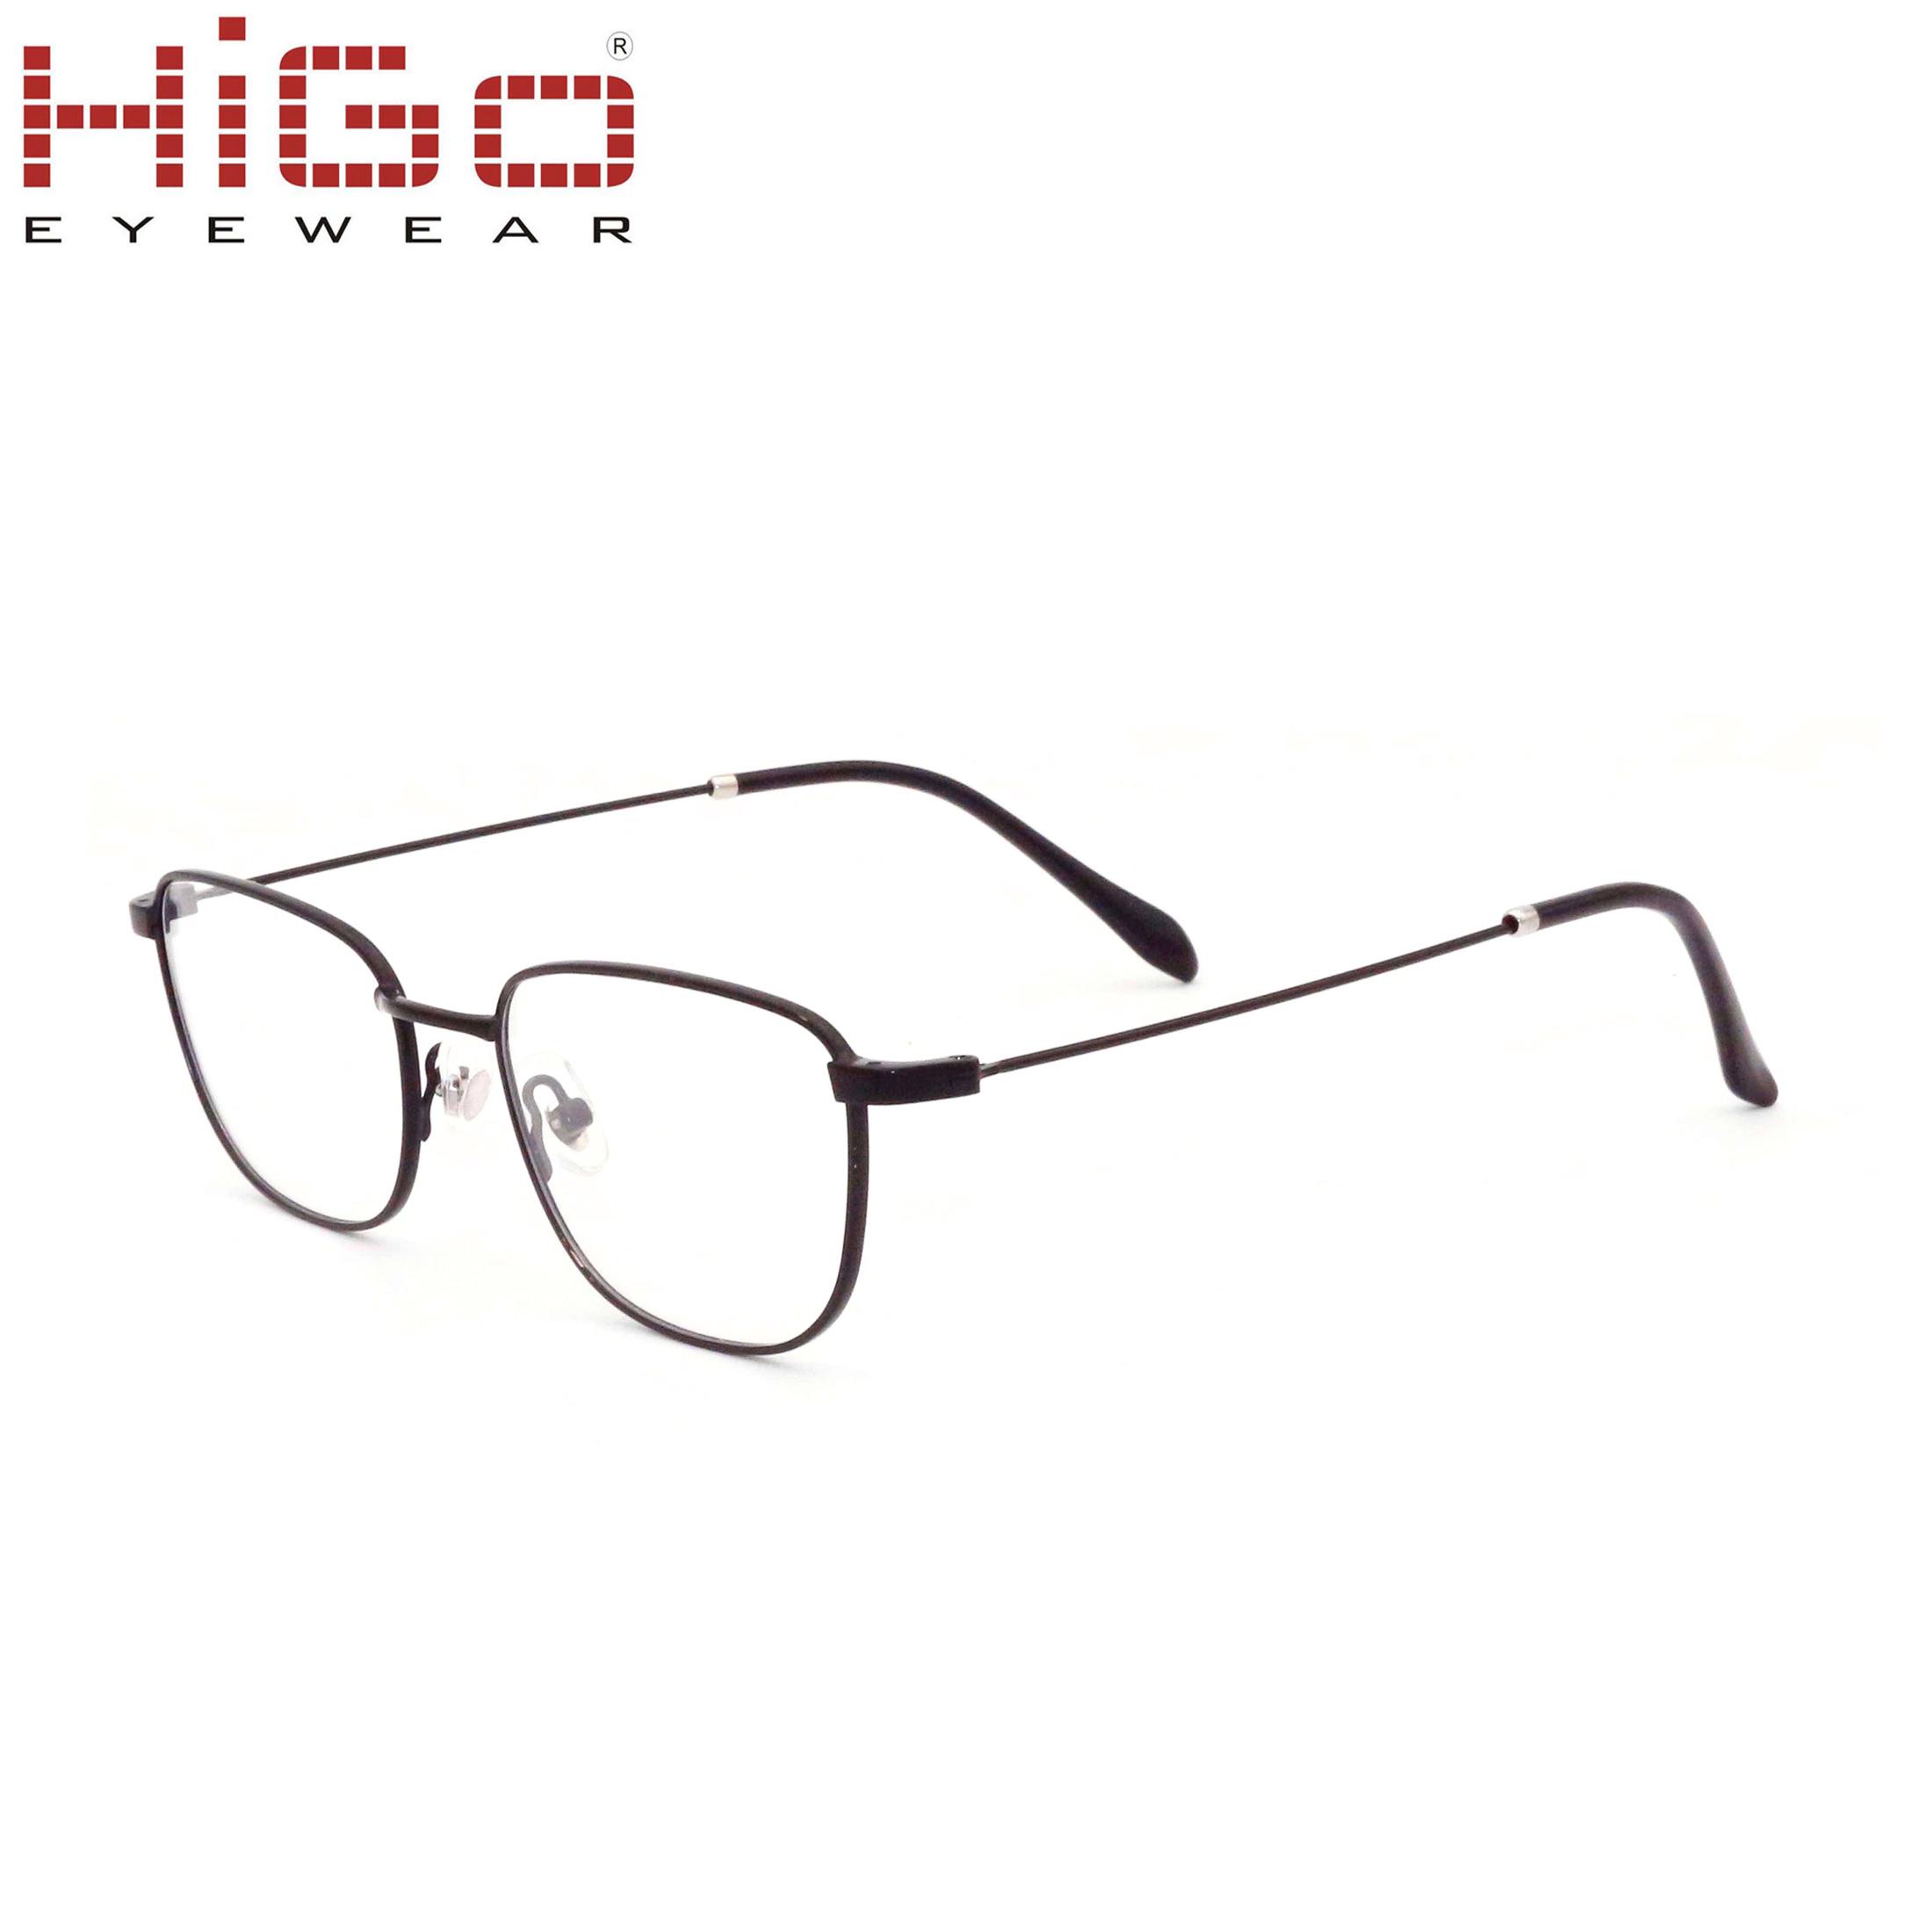 China Wholesale Glasses Full Rim Optical Frame Metal Eyewear China ...